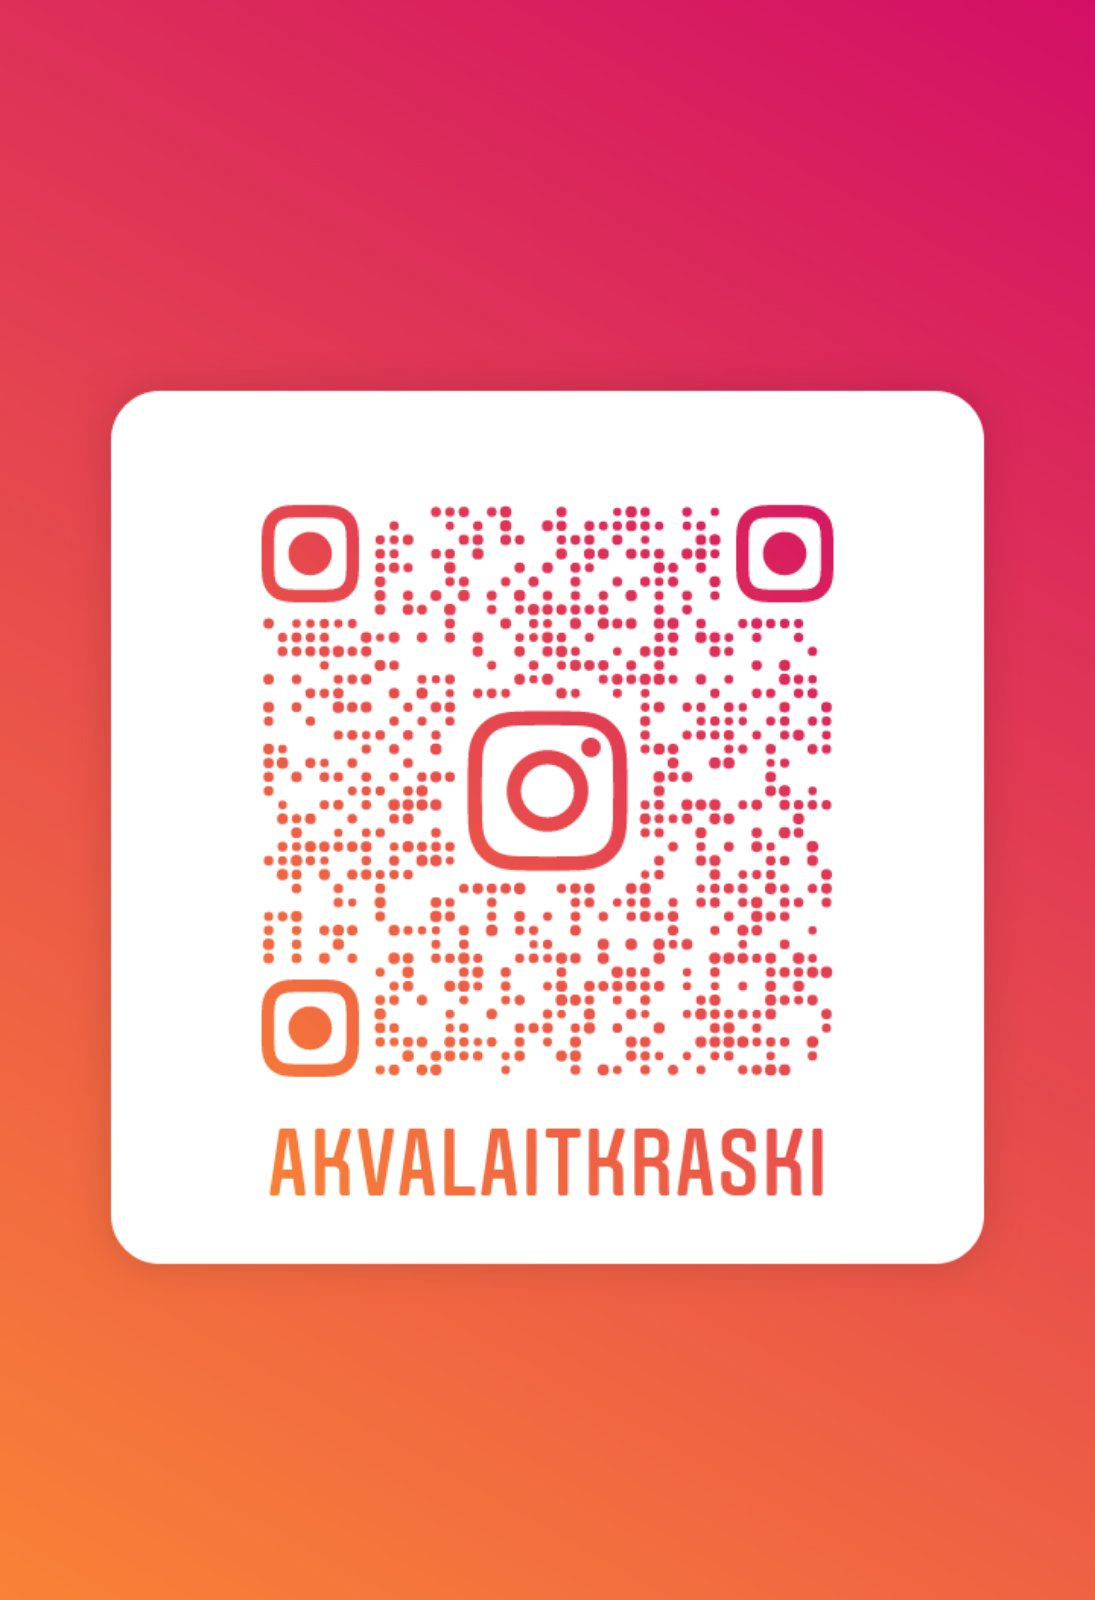 Аквалайт в Инстаграмм